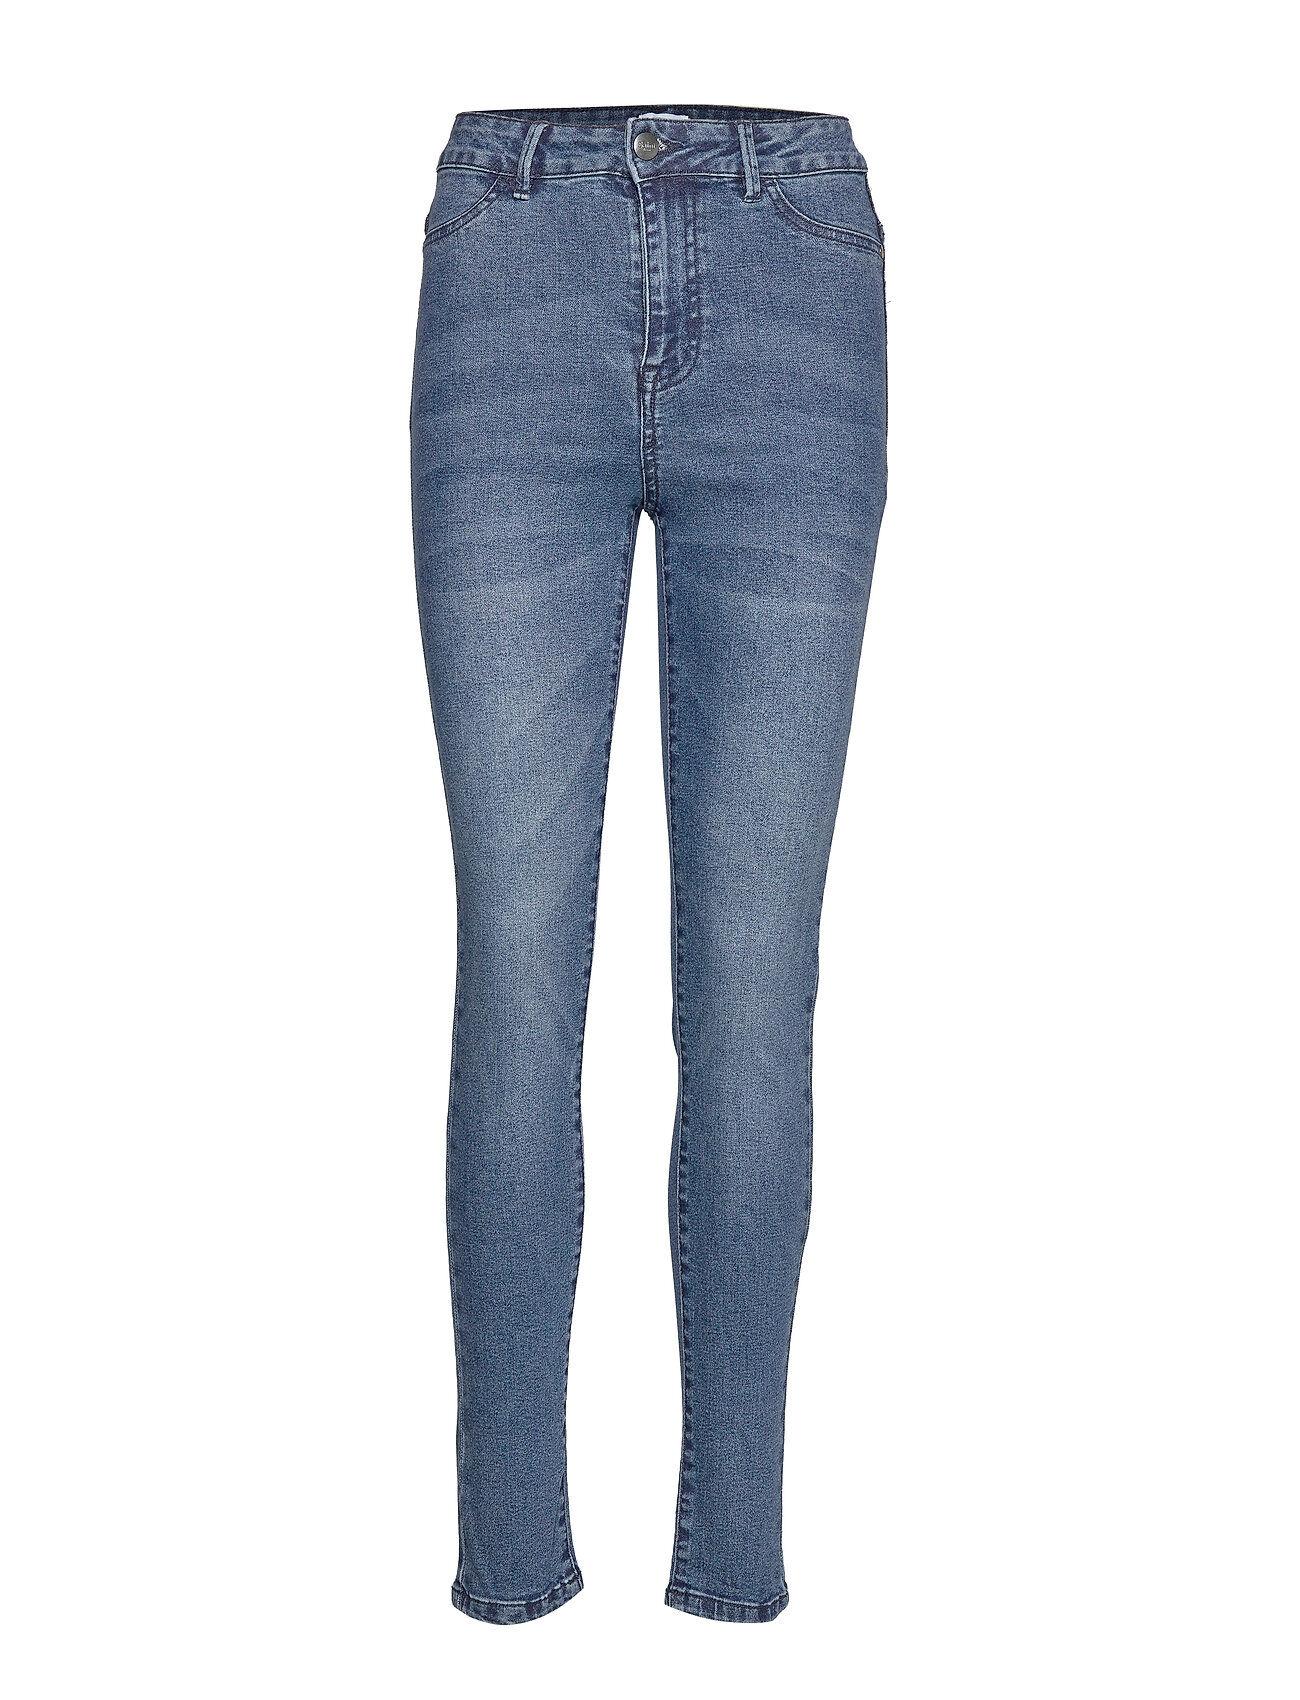 Saint Tropez T5757, Tinnasz Jeans Skinny Farkut Sininen Saint Tropez